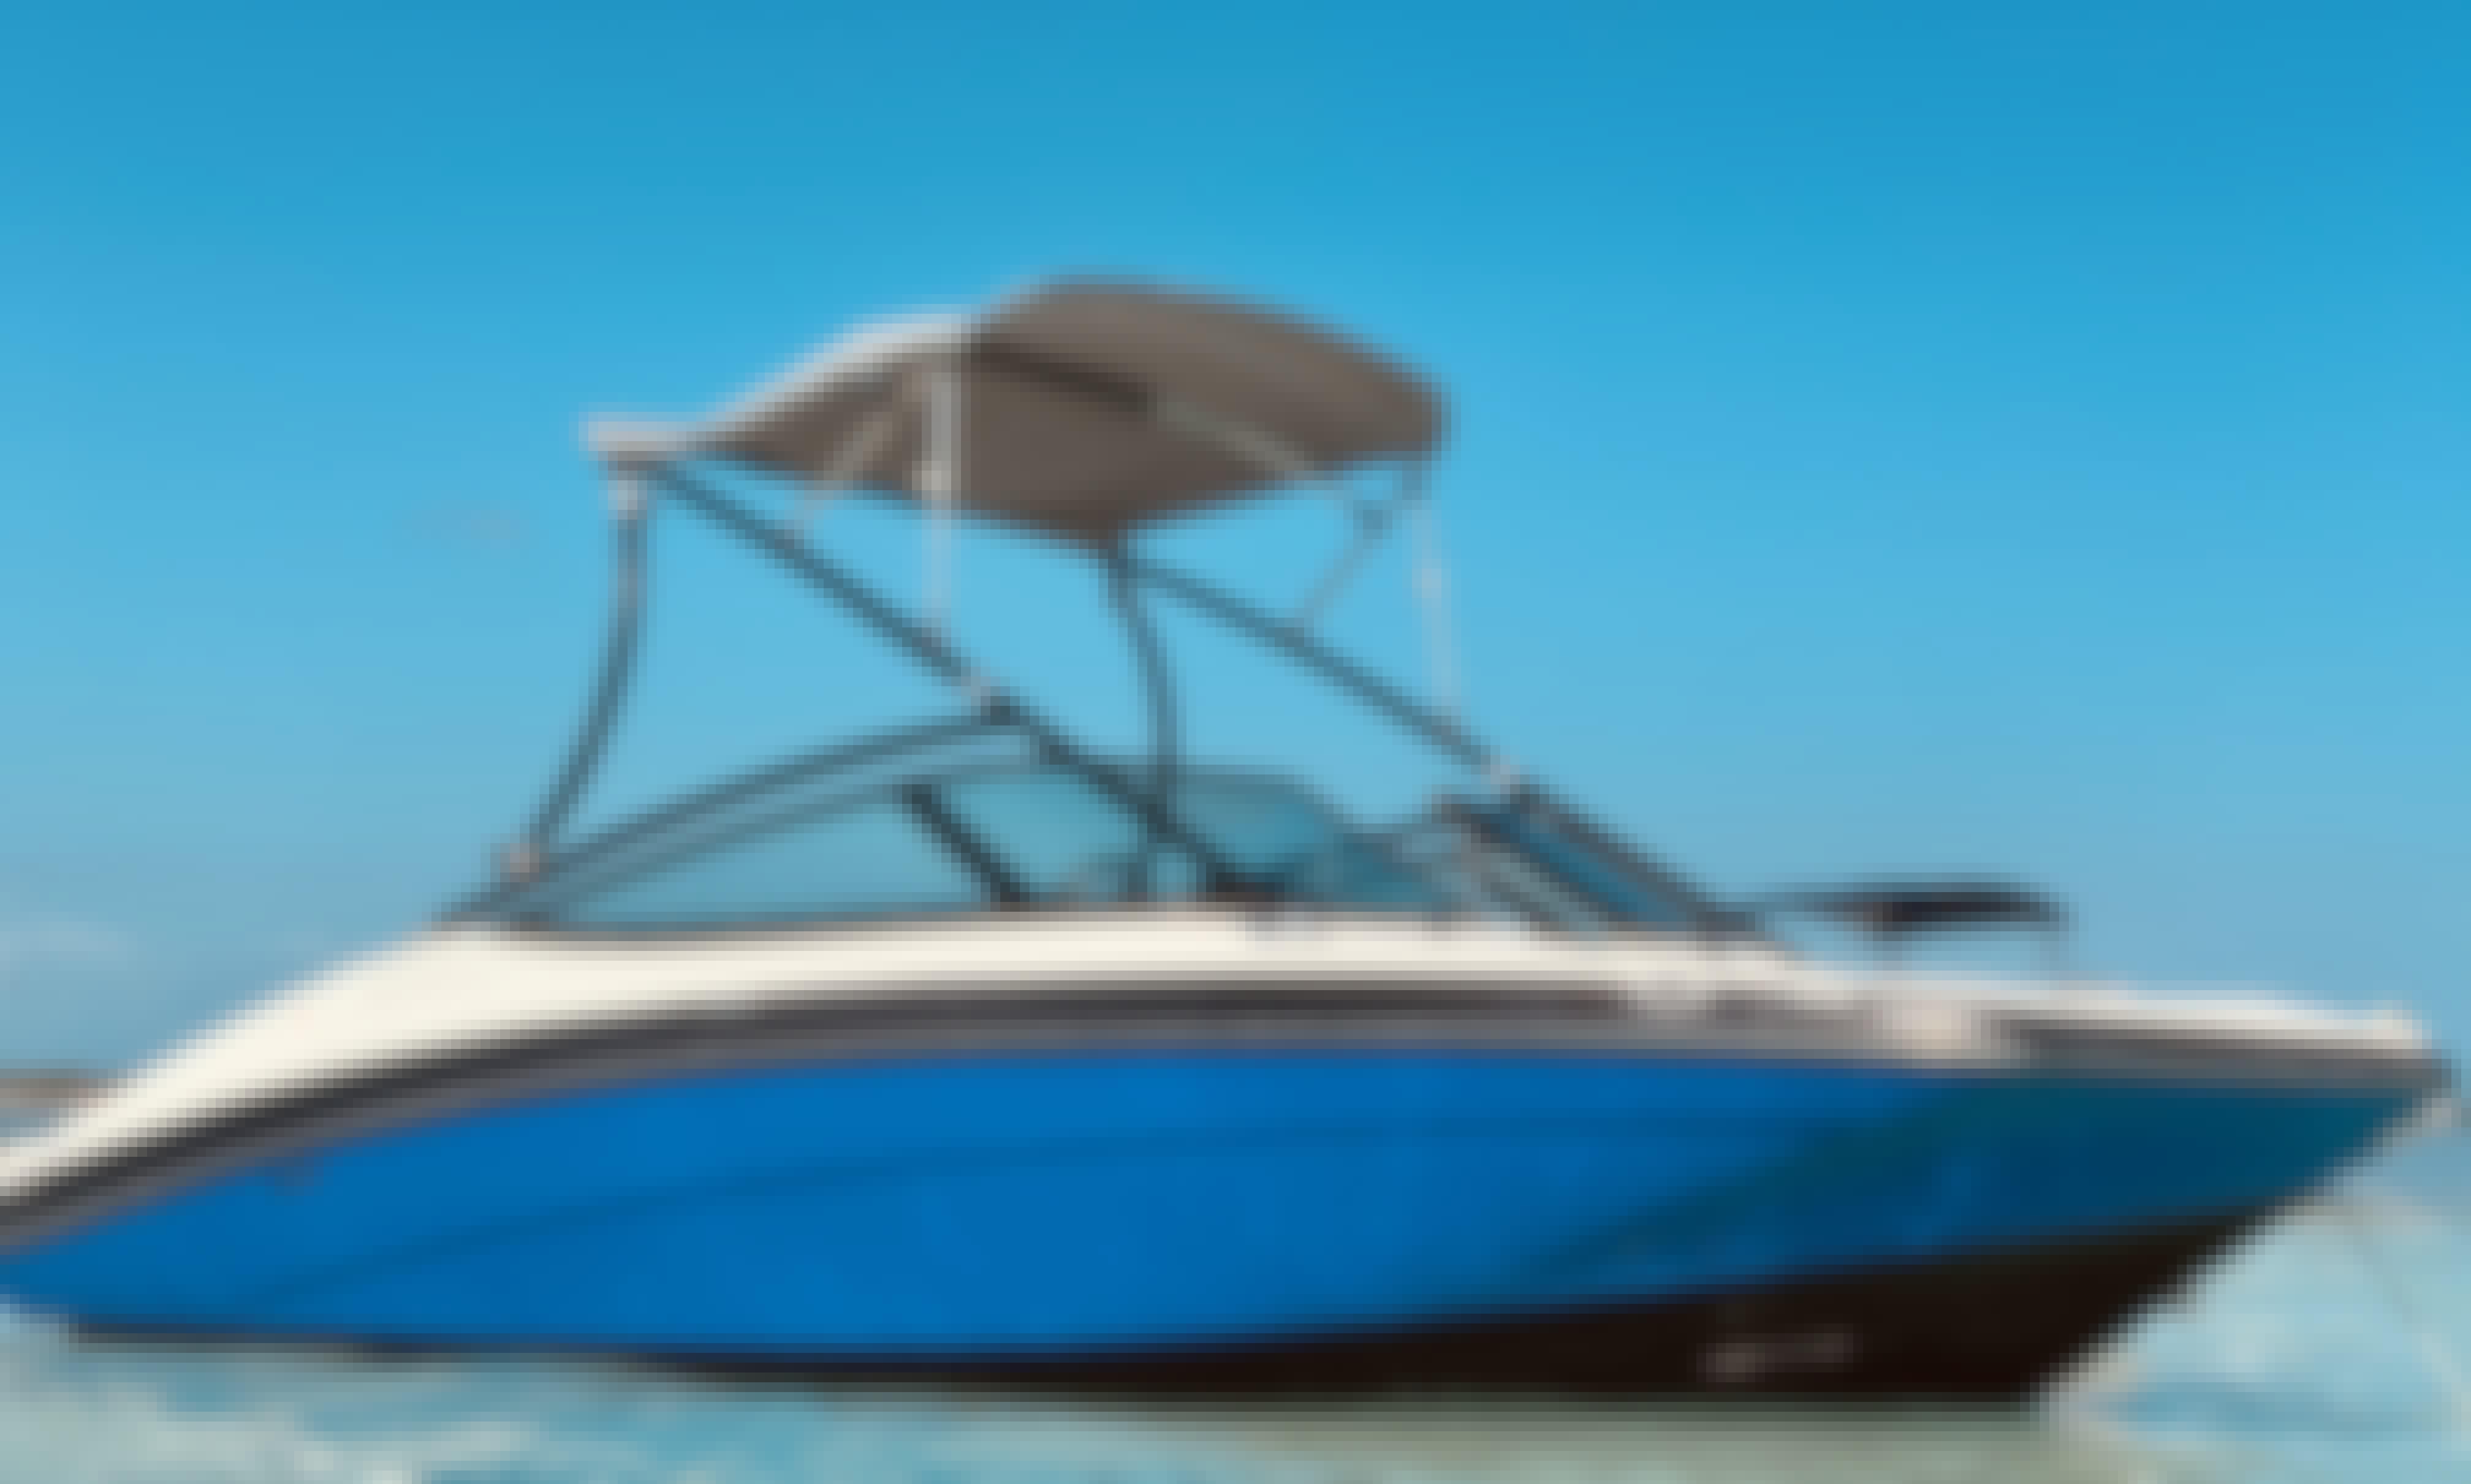 19' Yamaha Jet Boat in Miami, Florida!